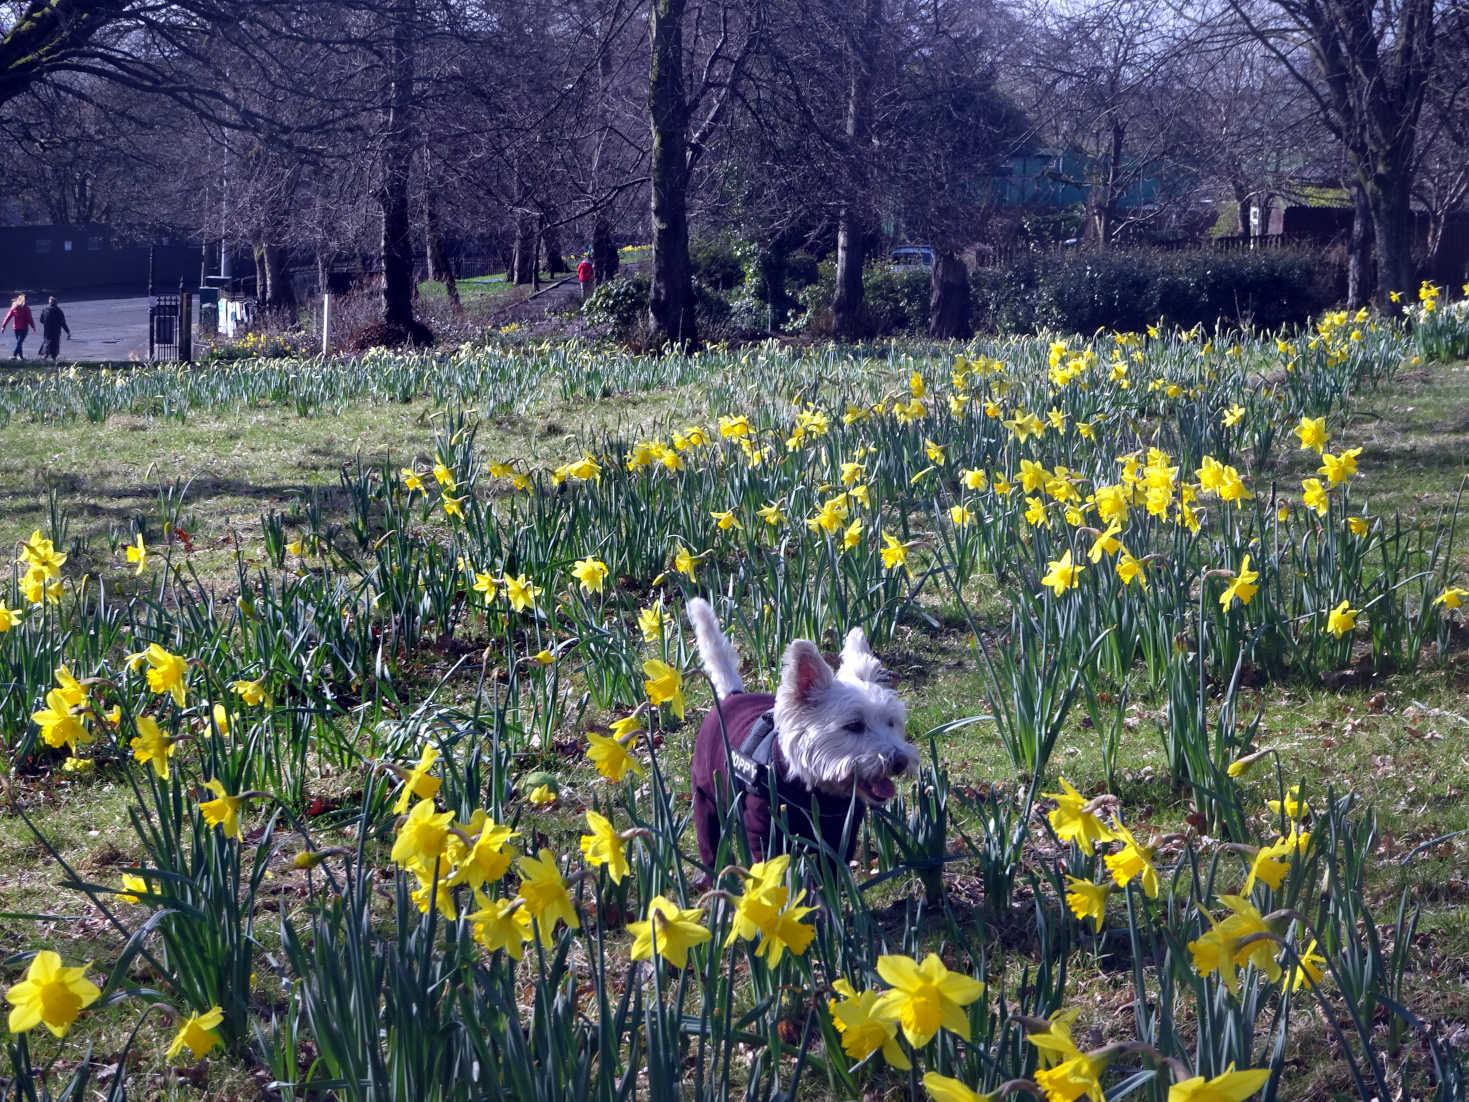 poppy the westie in home park in spring